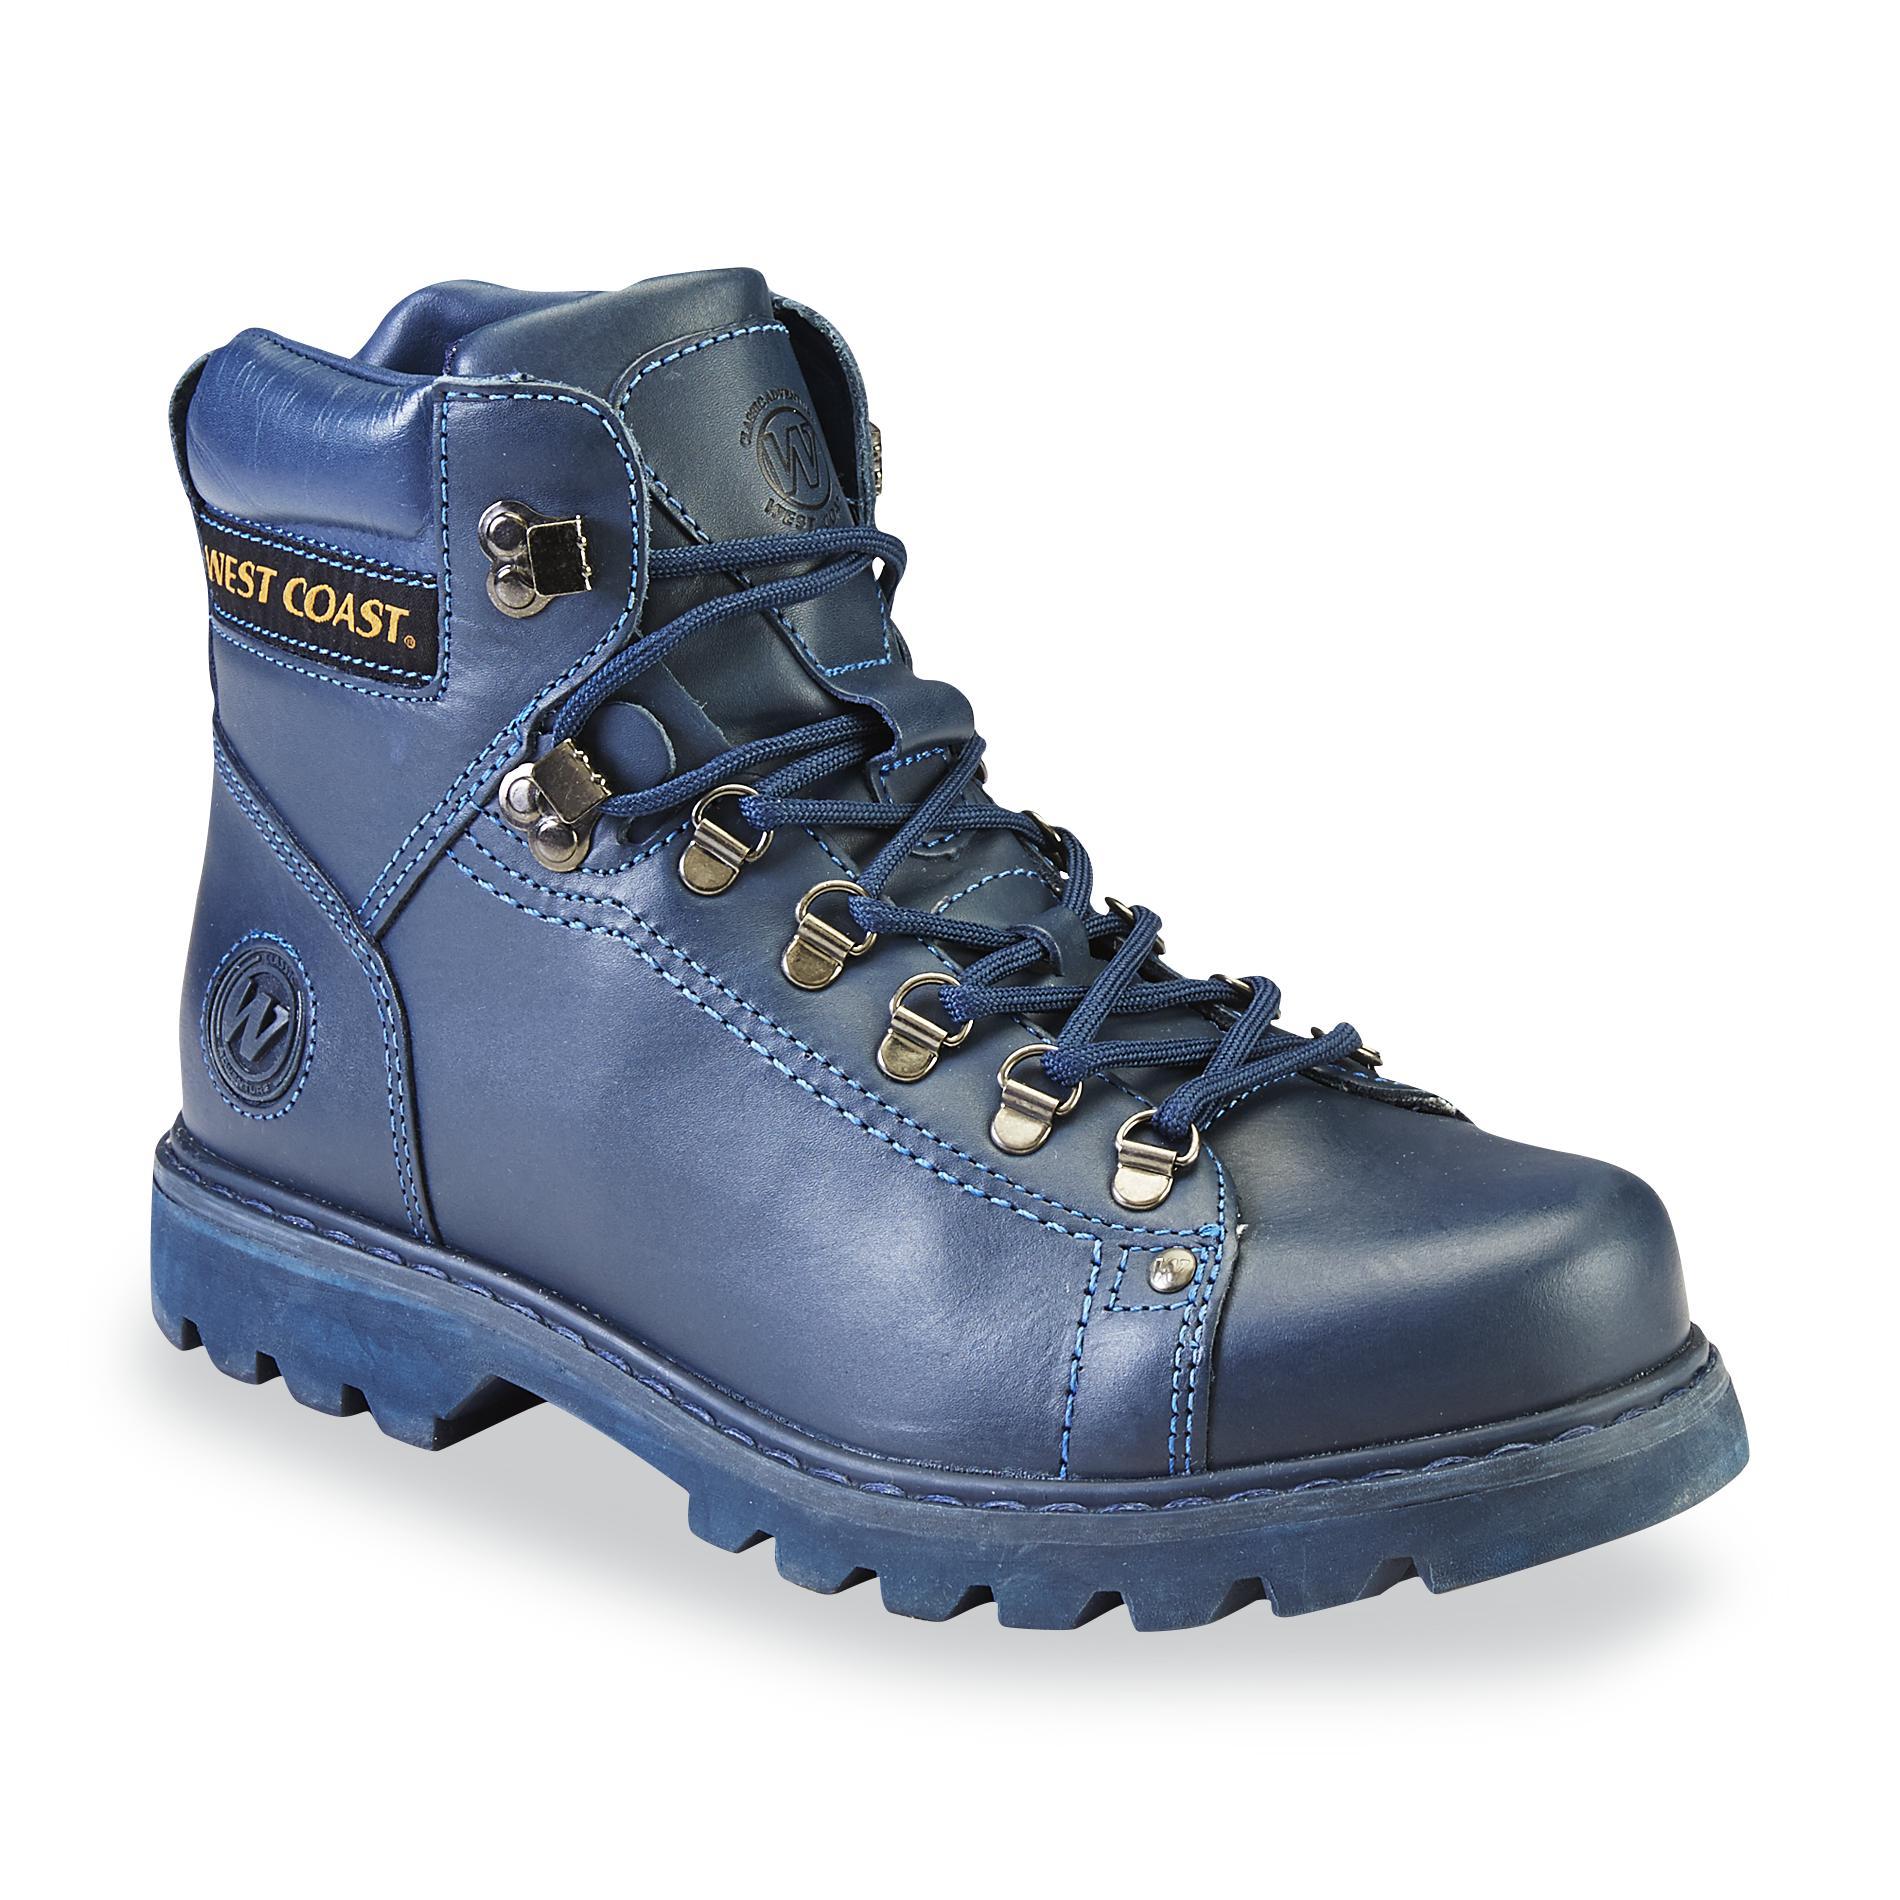 West Coast Men's Igor Leather Hiking Boot - Blue PartNumber: 067VA86460812P MfgPartNumber: 5790-13